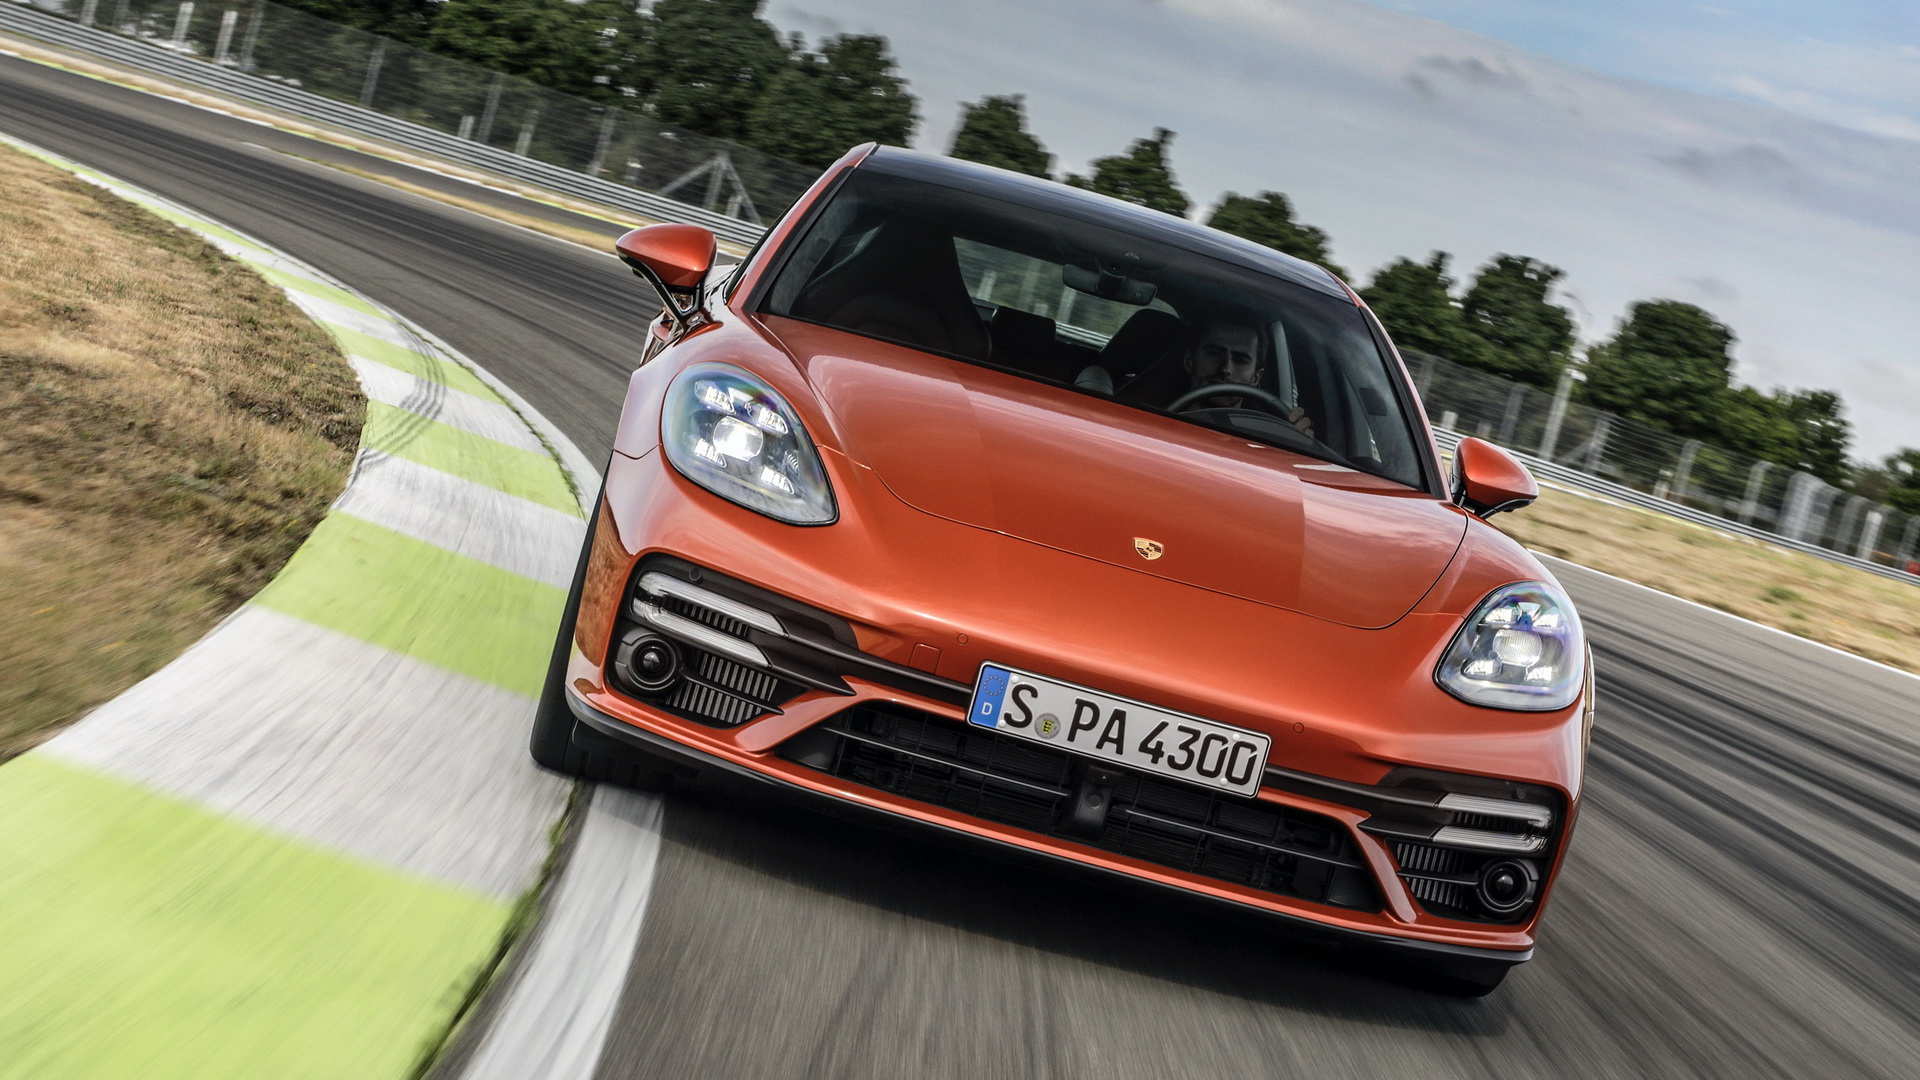 2021-Porsche-Panamera (3)